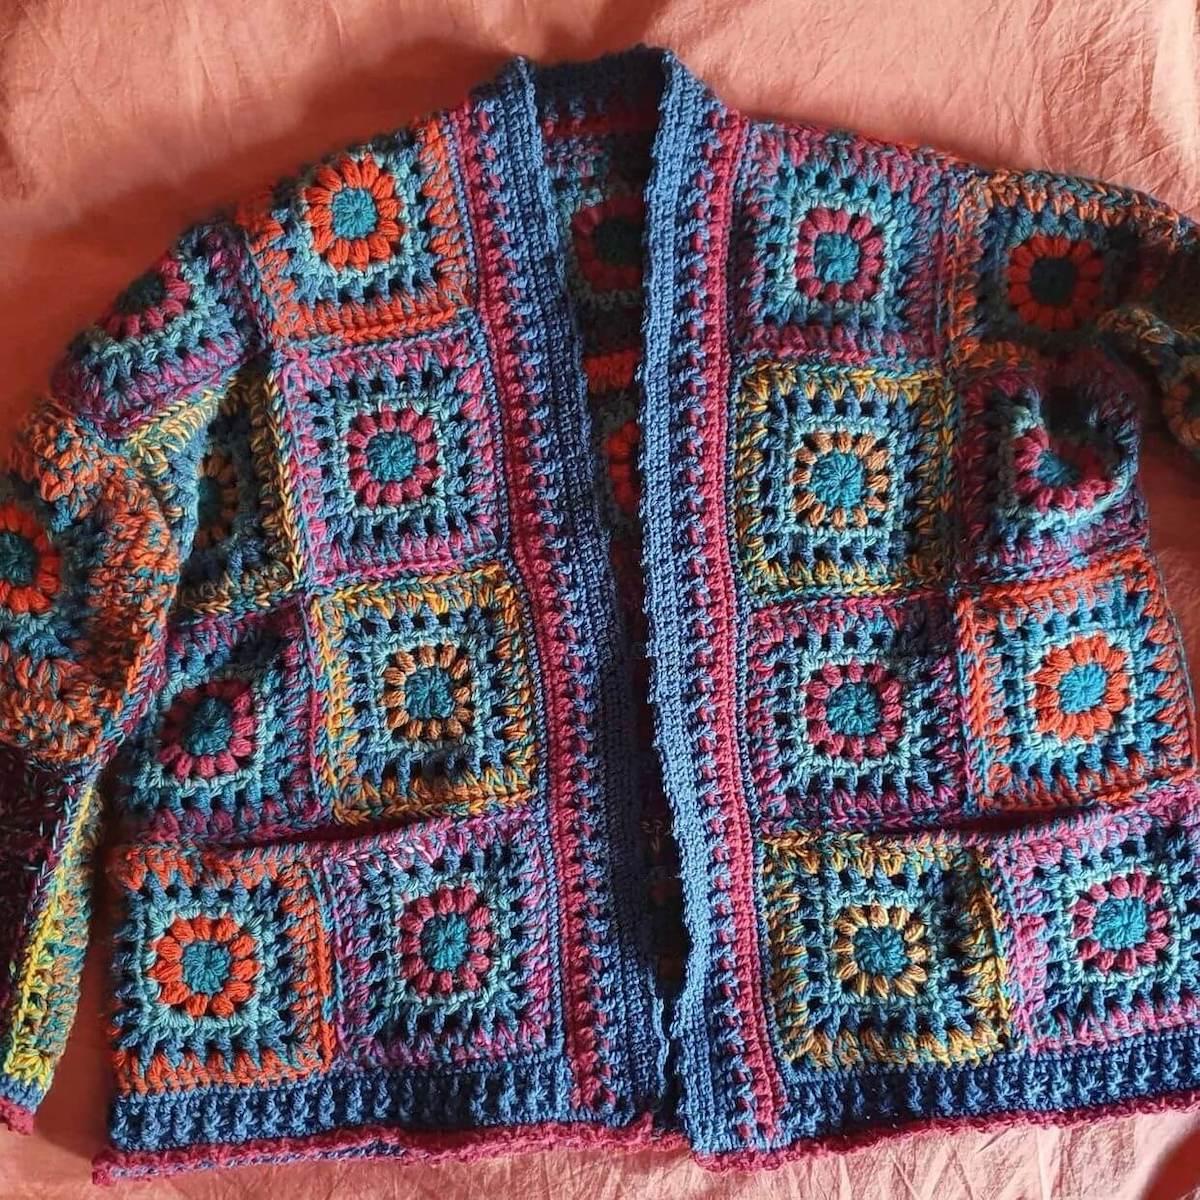 Crochet scrap yarn granny square cardigan made by mumski_34 - free crochet pattern by Wilmade